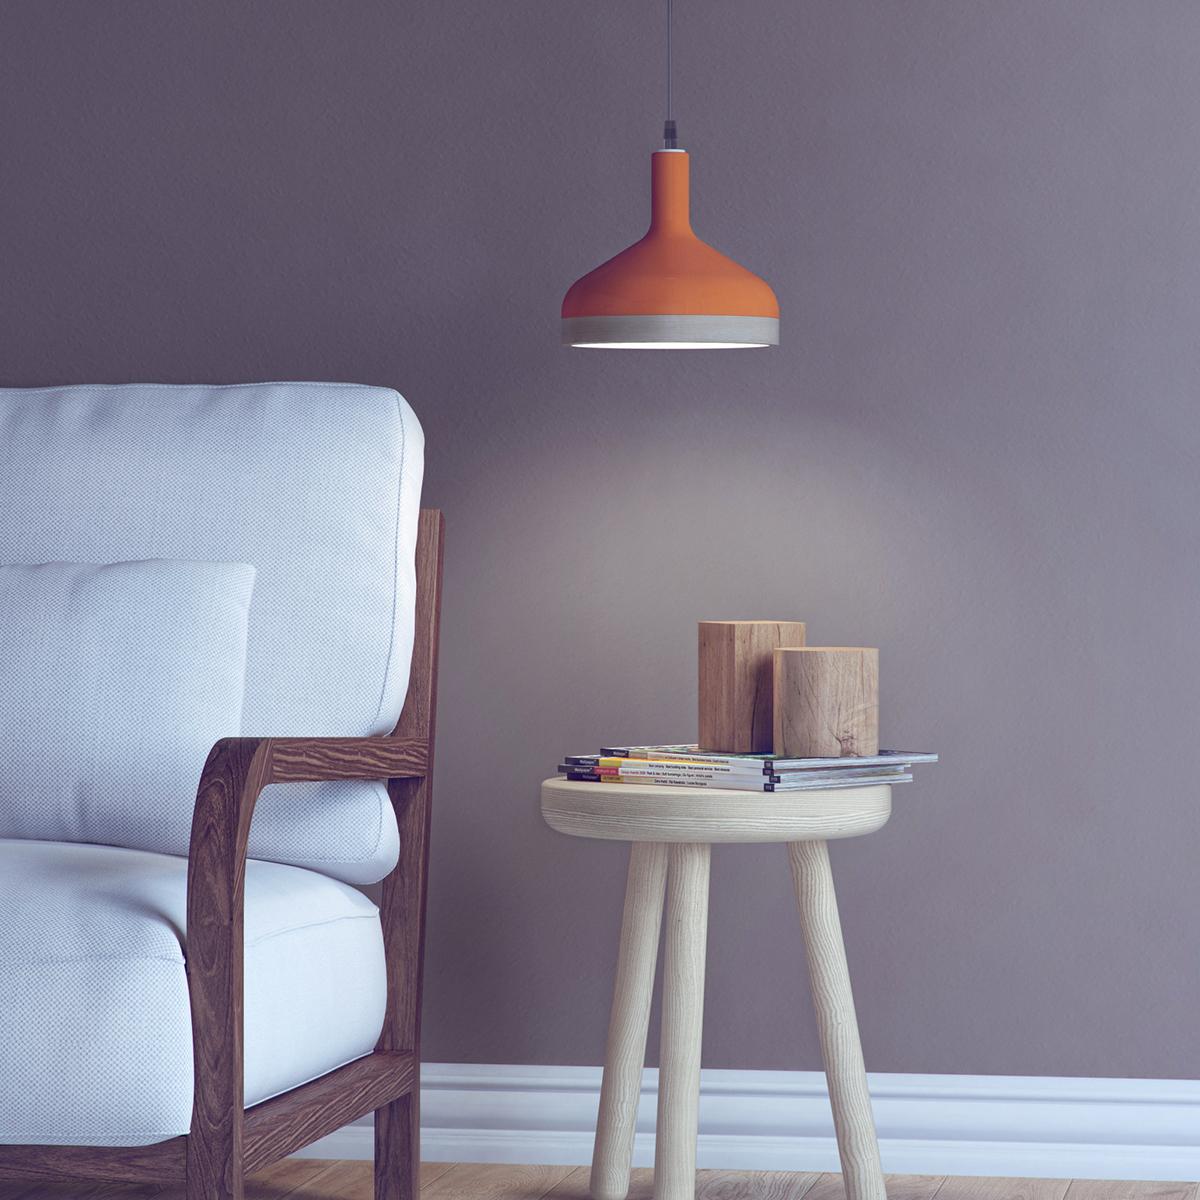 Plera Lamp by Enrico Zanolla - 06